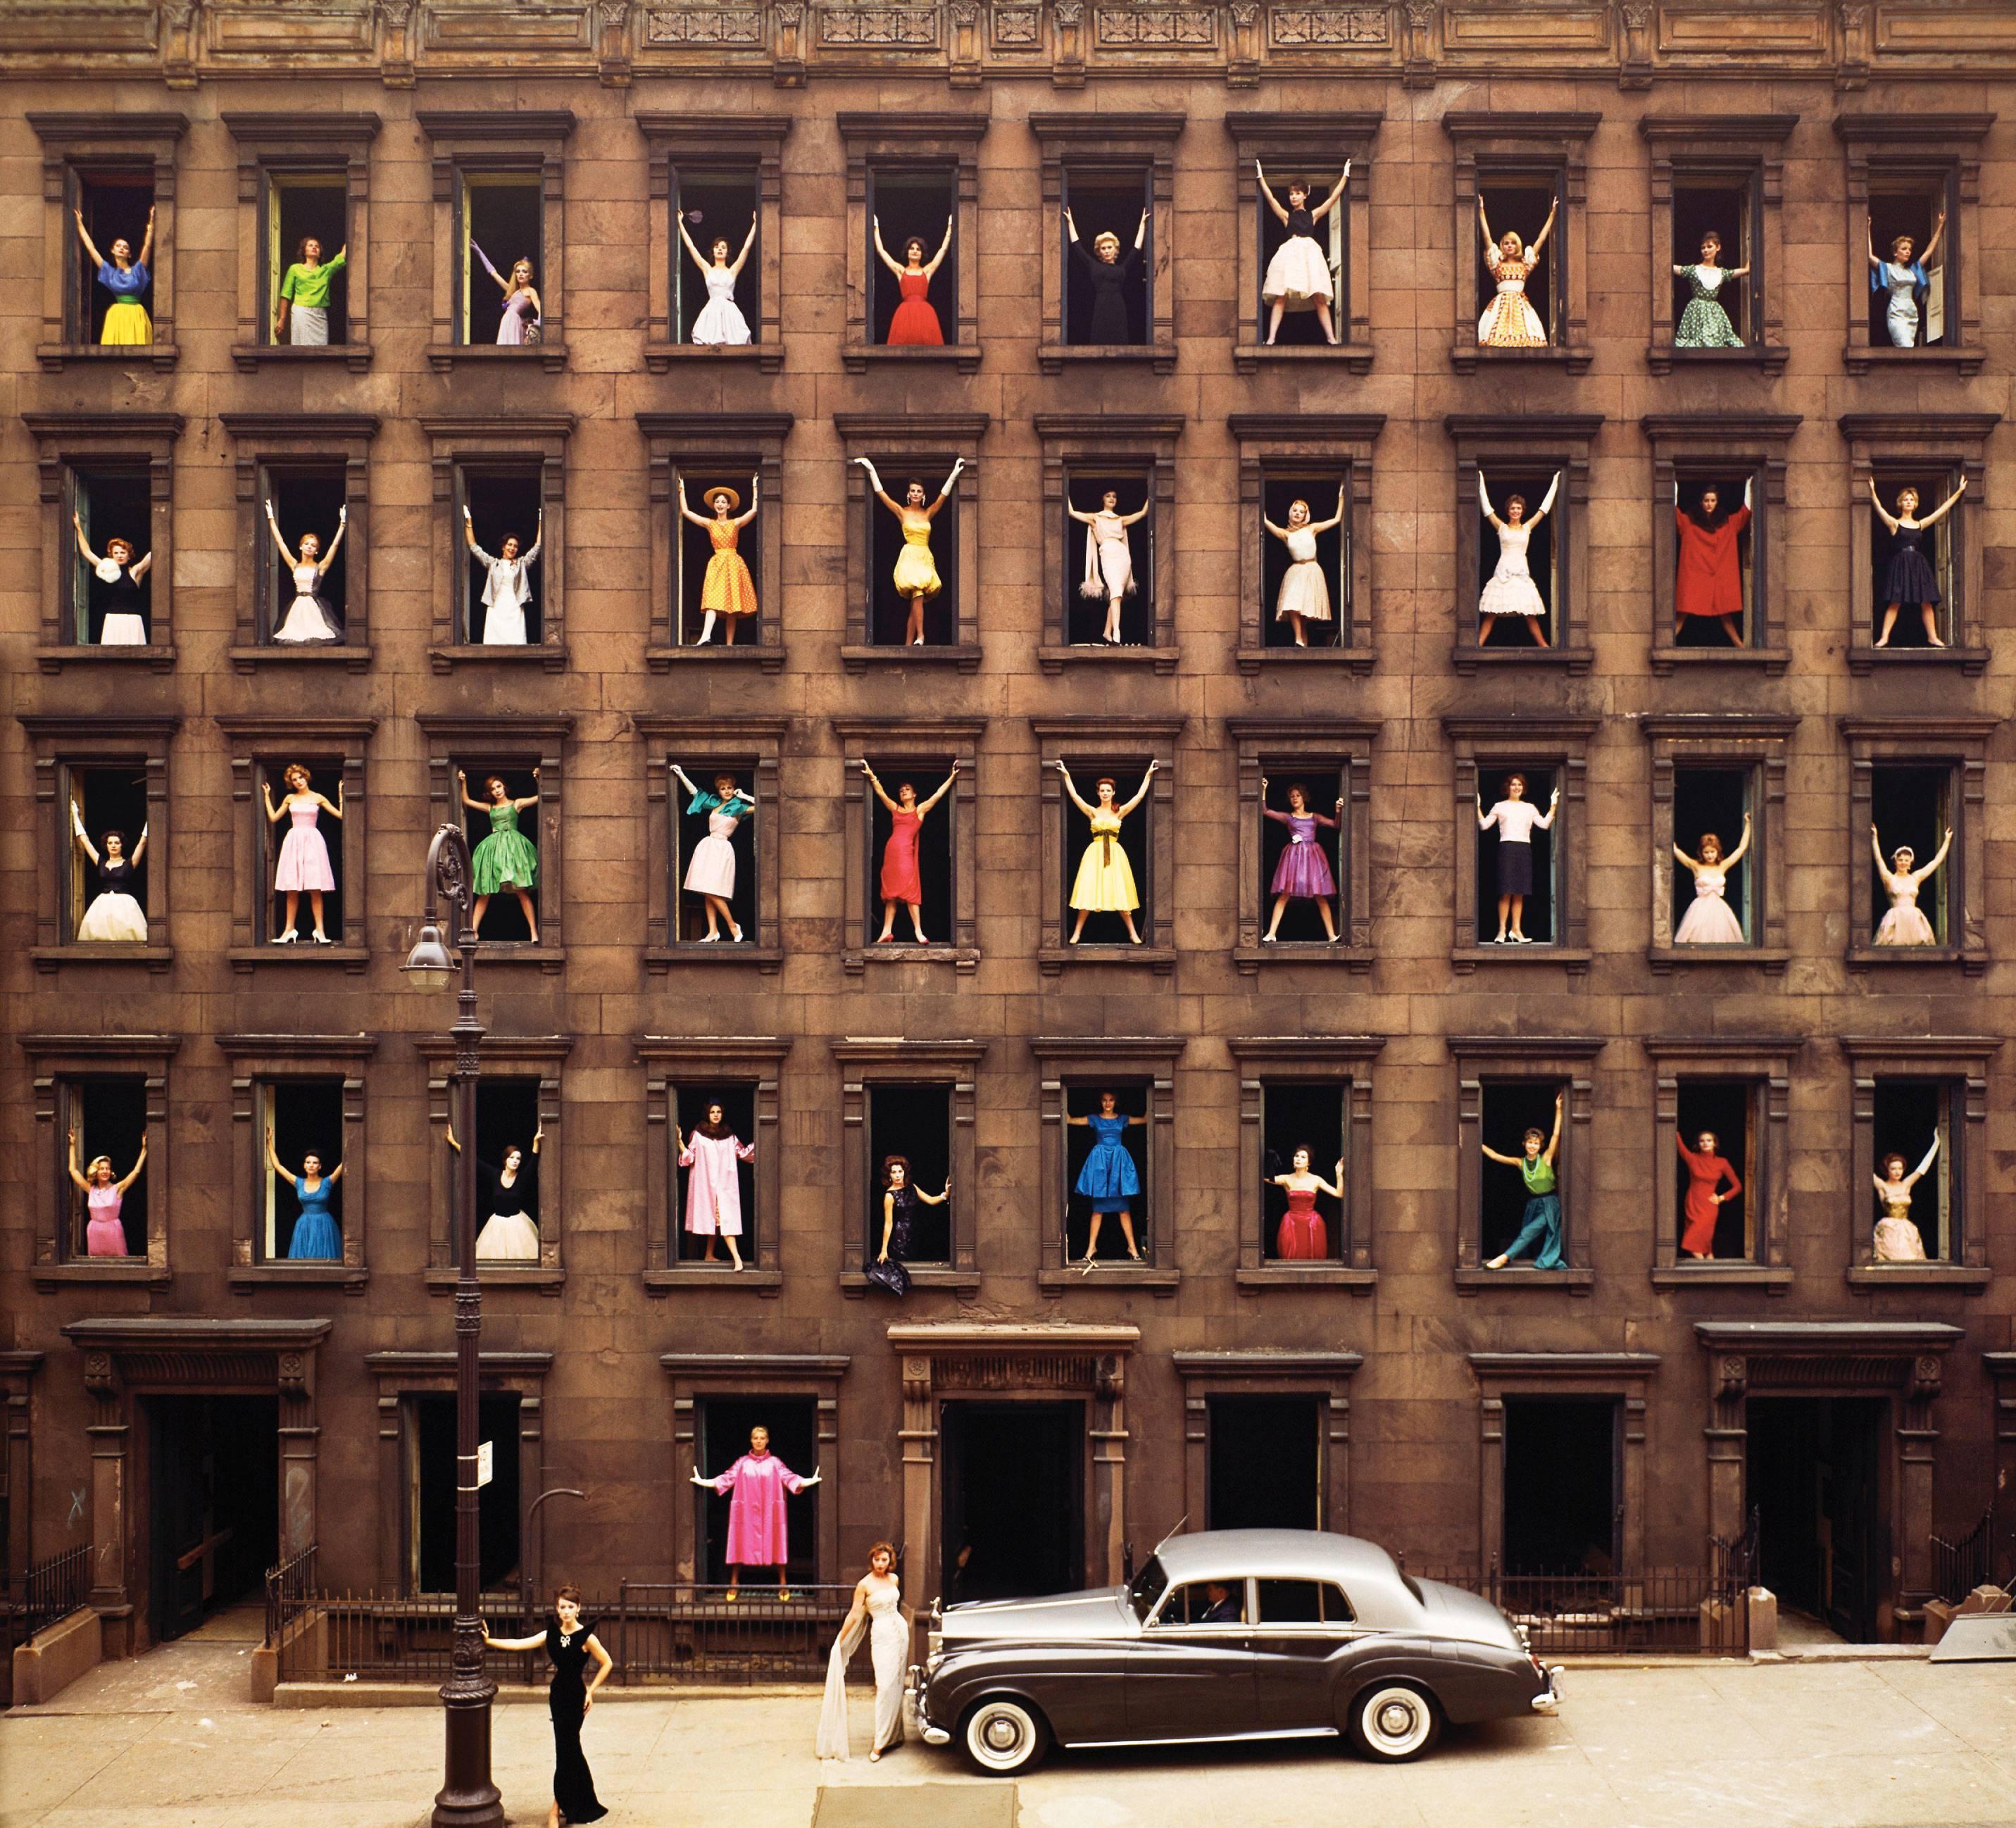 Girls in Windows, New York, 1960, by Ormond Gigli